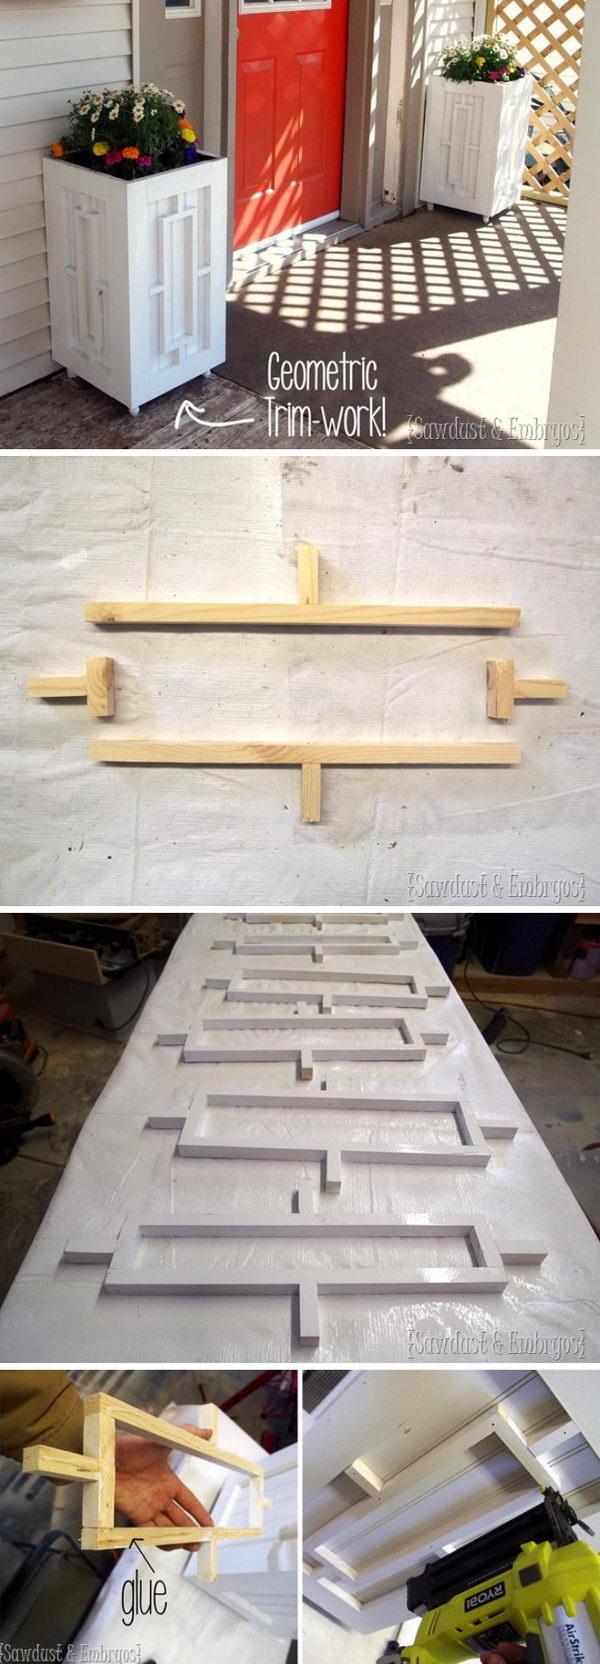 Custom Planter Boxes with Geometric Inlays.